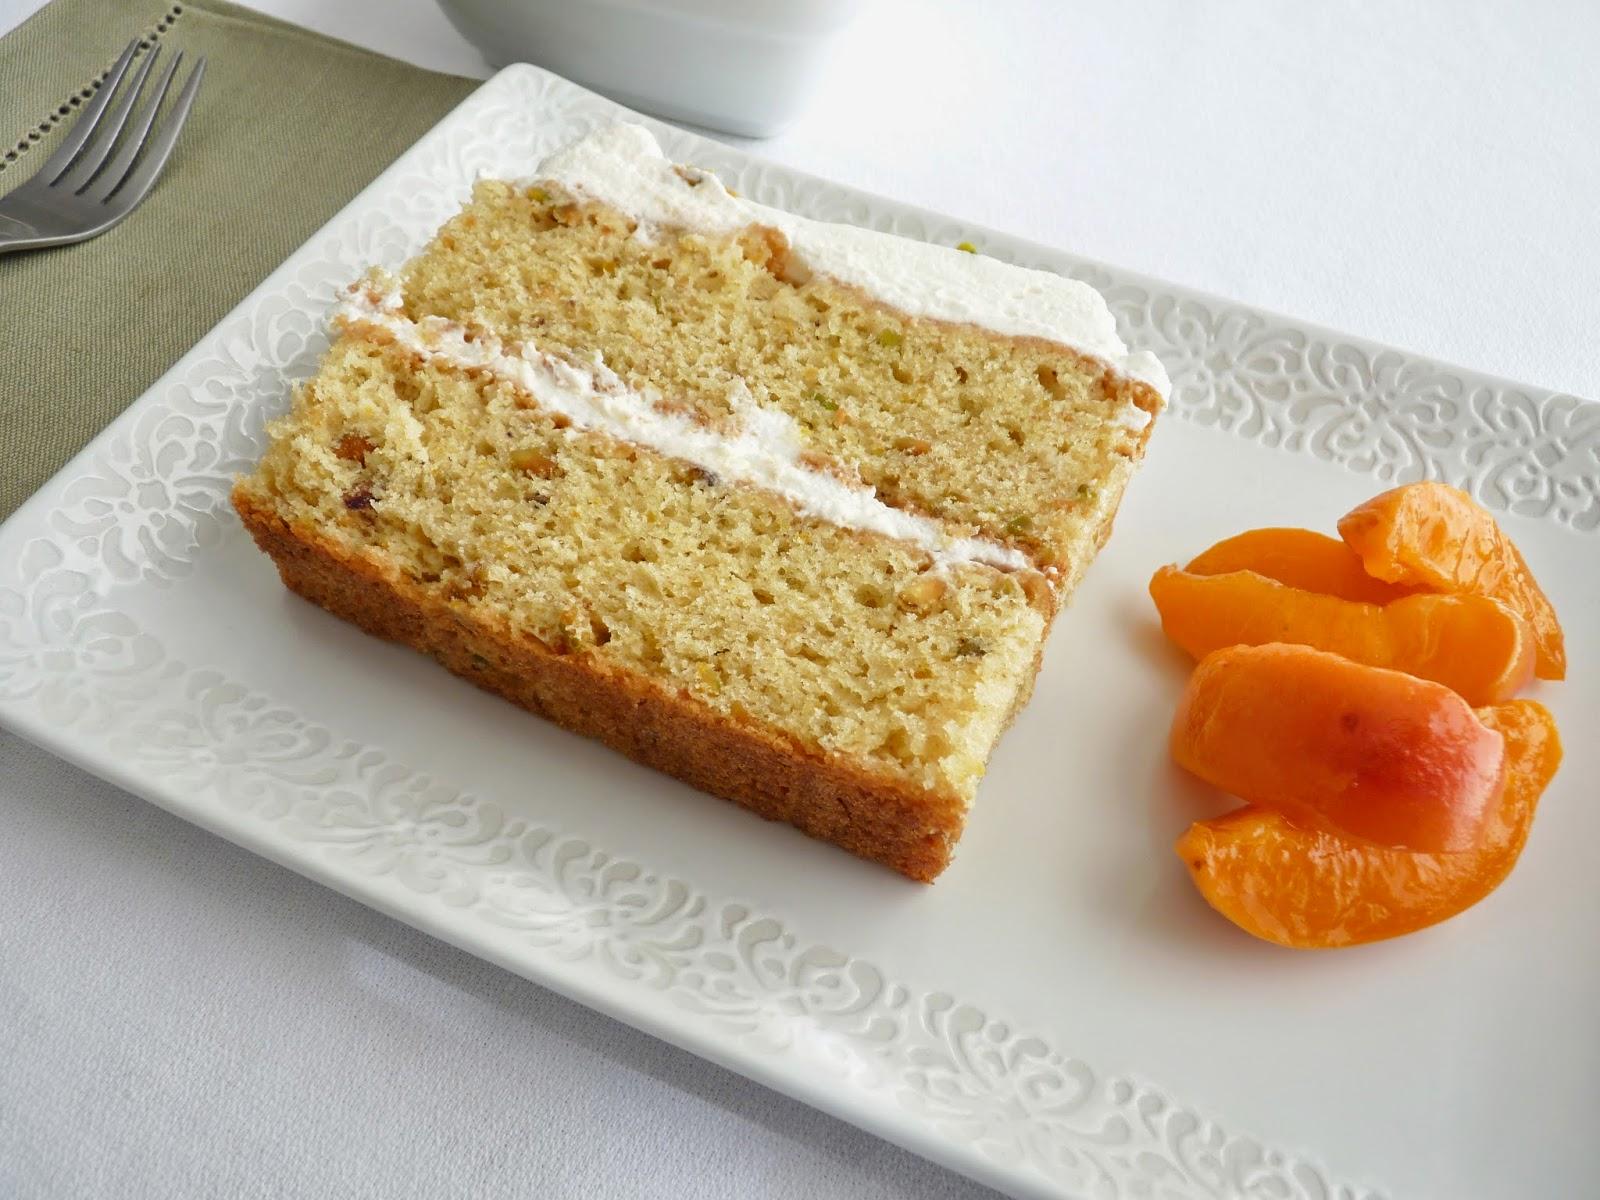 pastry studio: Pistachio Cake with Nougat Cream